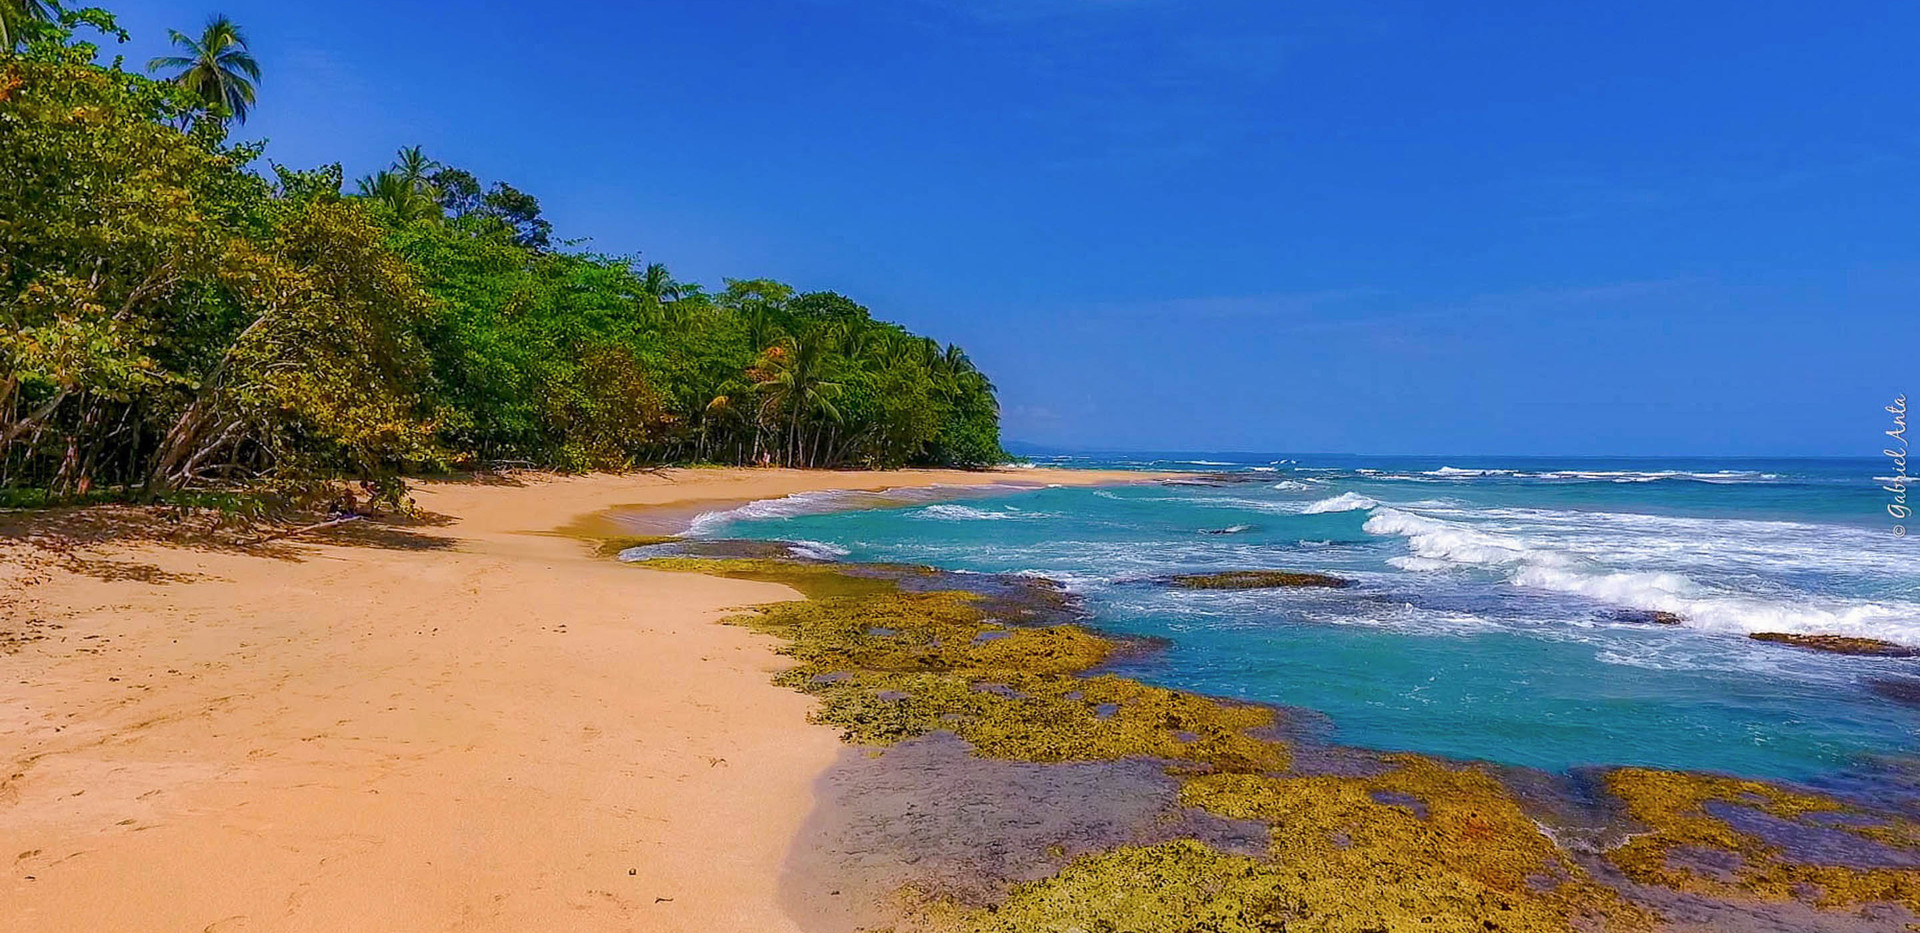 Playa-Chiquita-foto-Gabriel-Anta-2.jpg